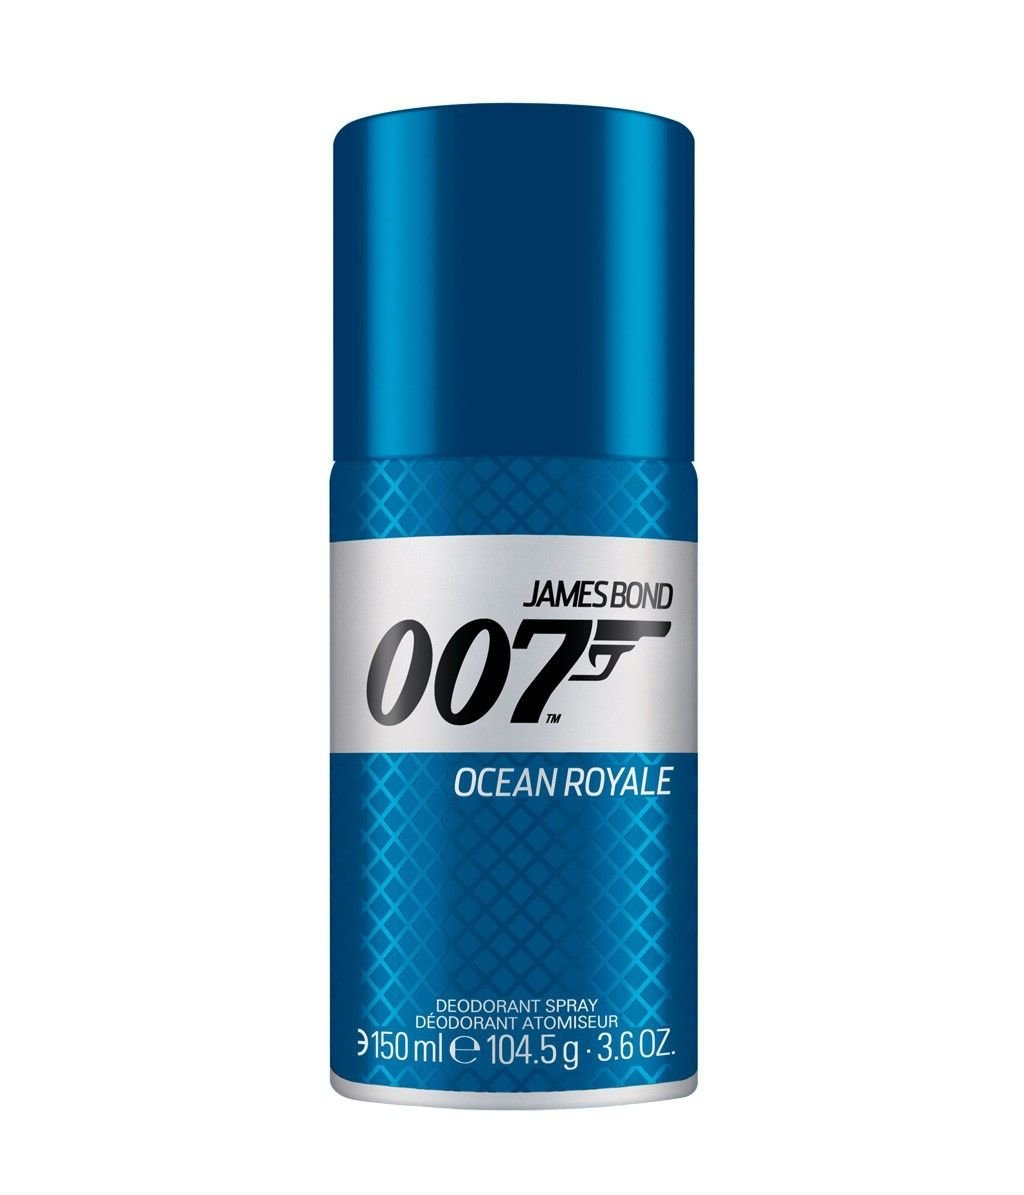 James Bond 007 Ocean Royale Deodorant 150ml